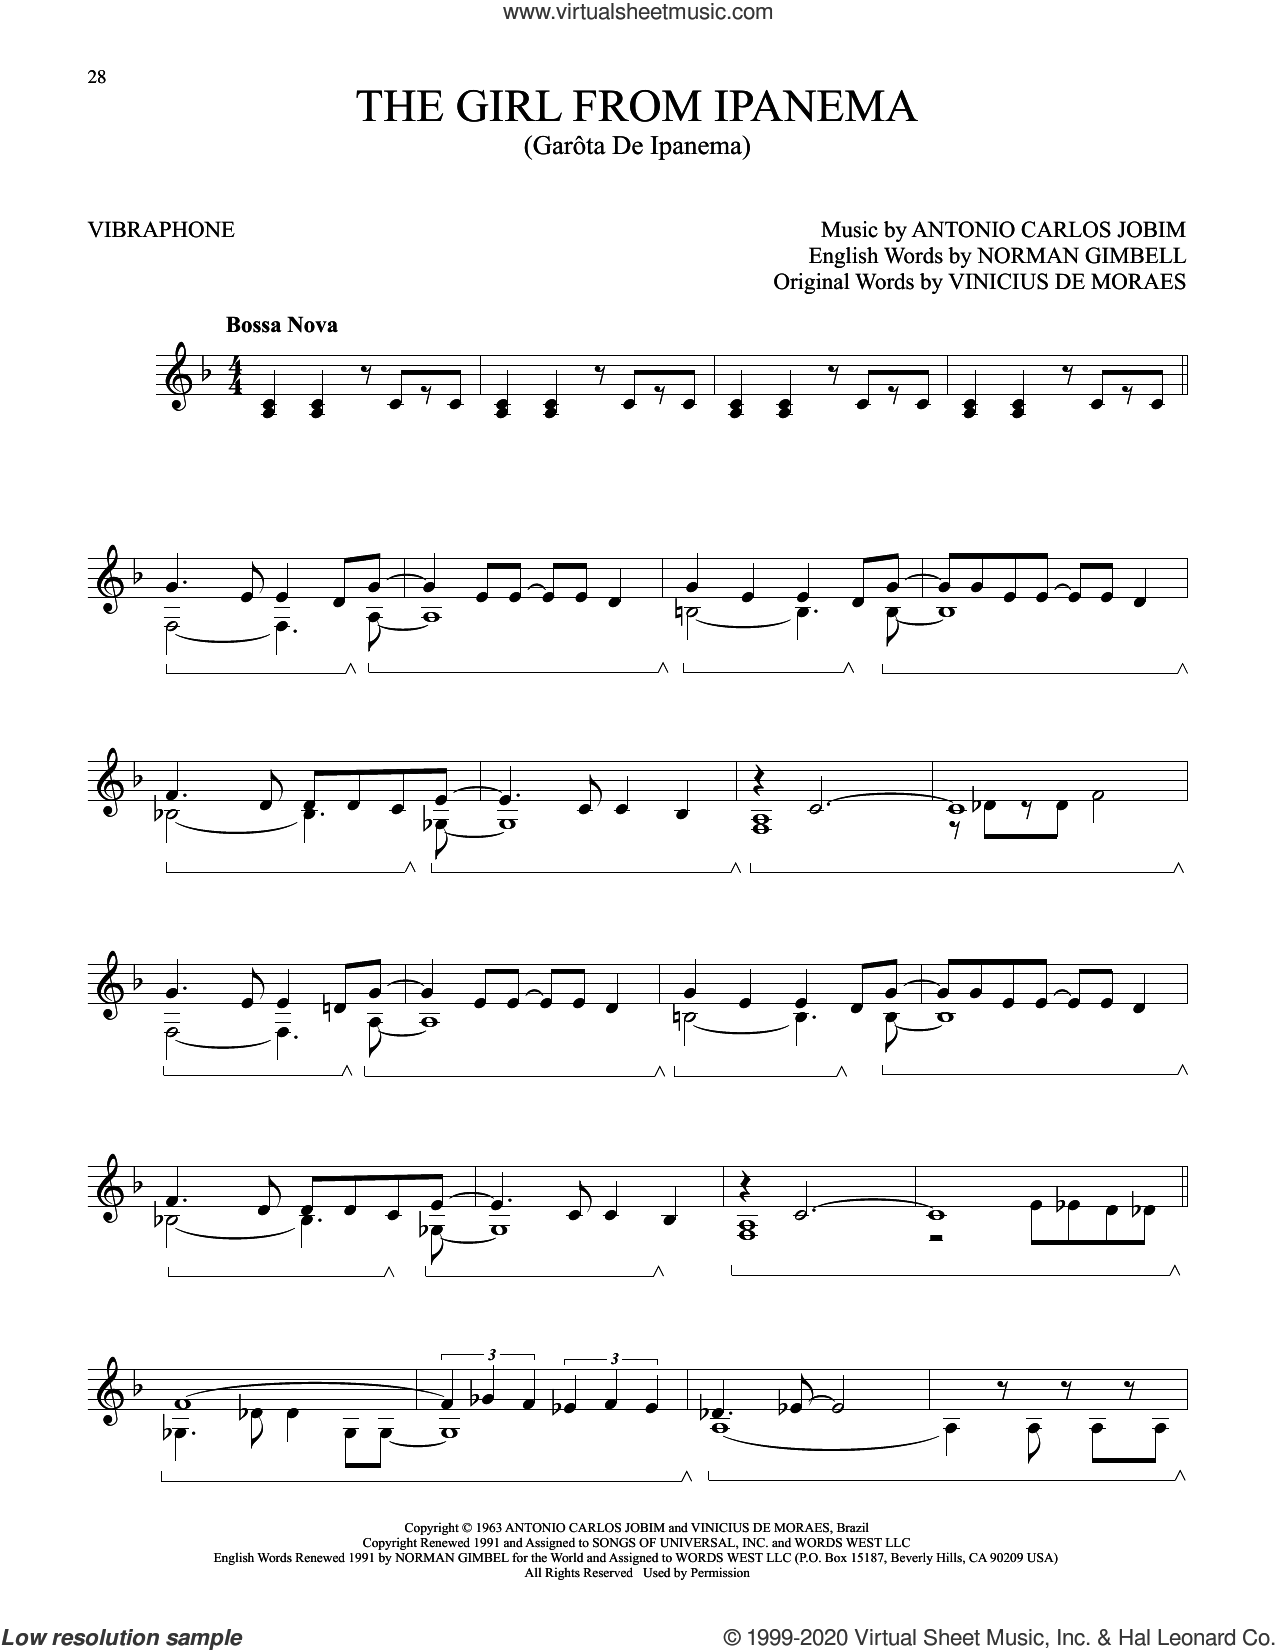 The Girl From Ipanema (Garota De Ipanema) sheet music for Vibraphone Solo by Norman Gimbel, Antonio Carlos Jobim and Vinicius de Moraes, intermediate skill level